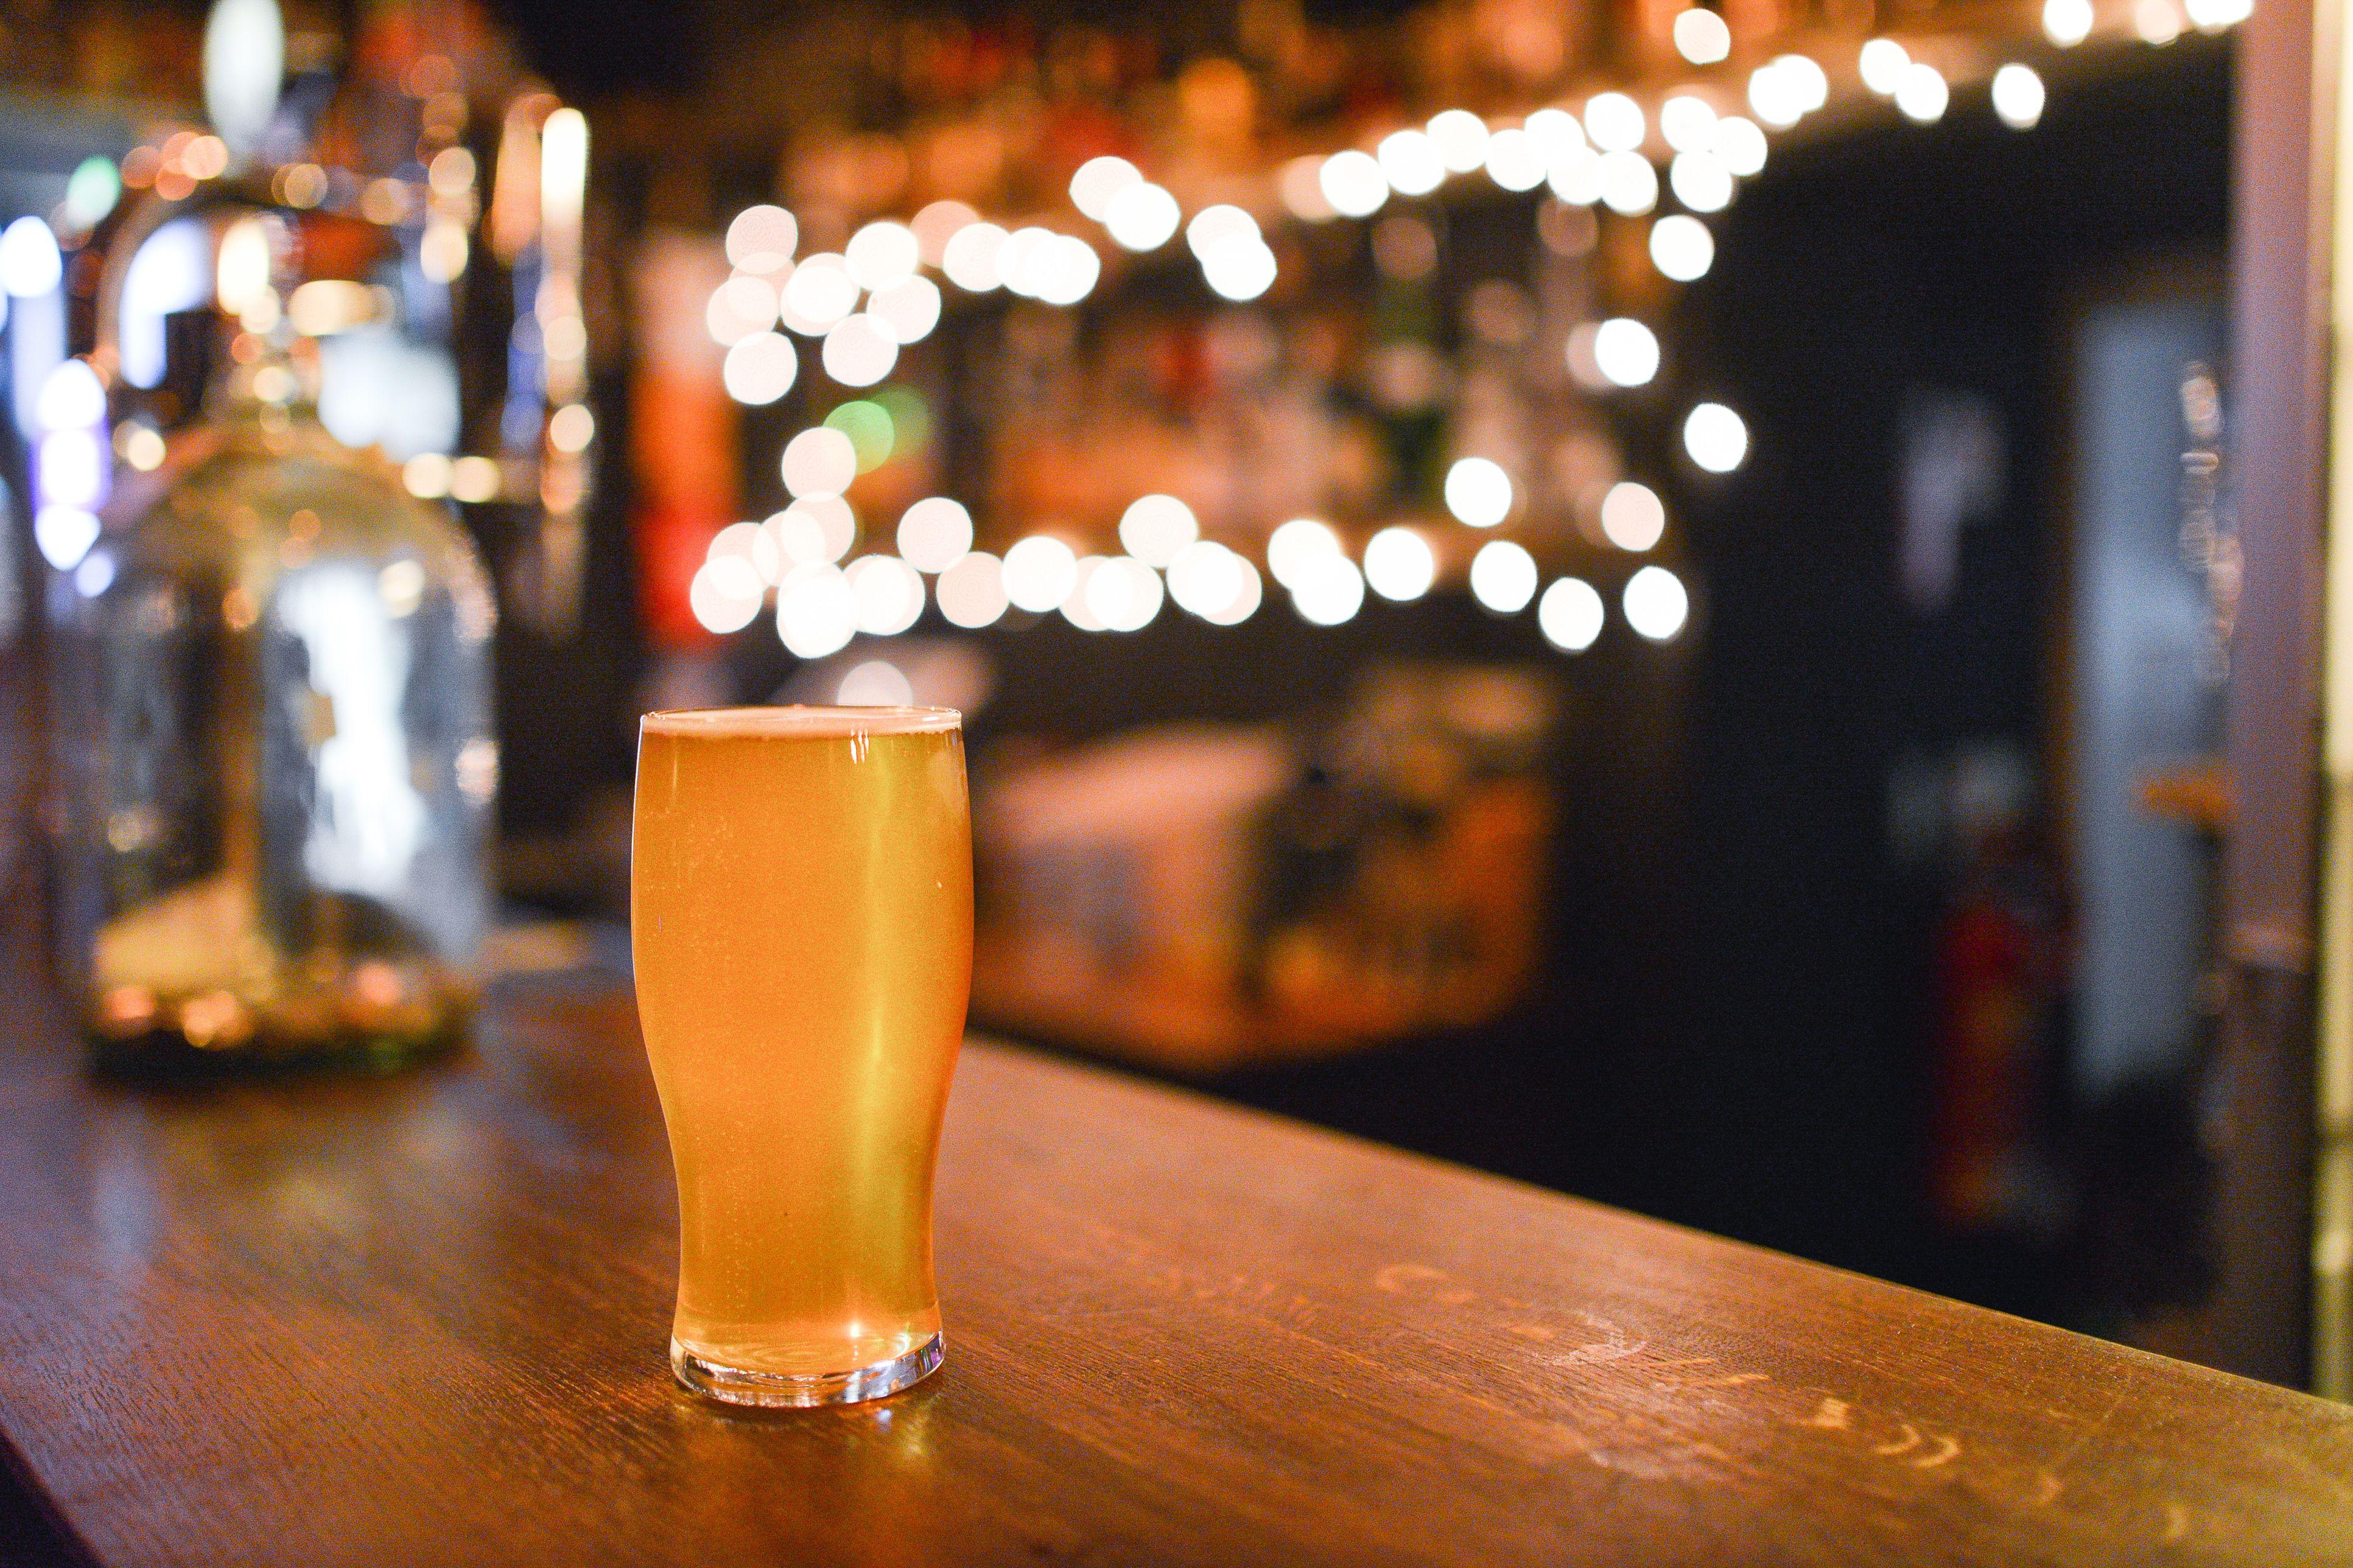 Primer plano de cerveza en Glass On Table